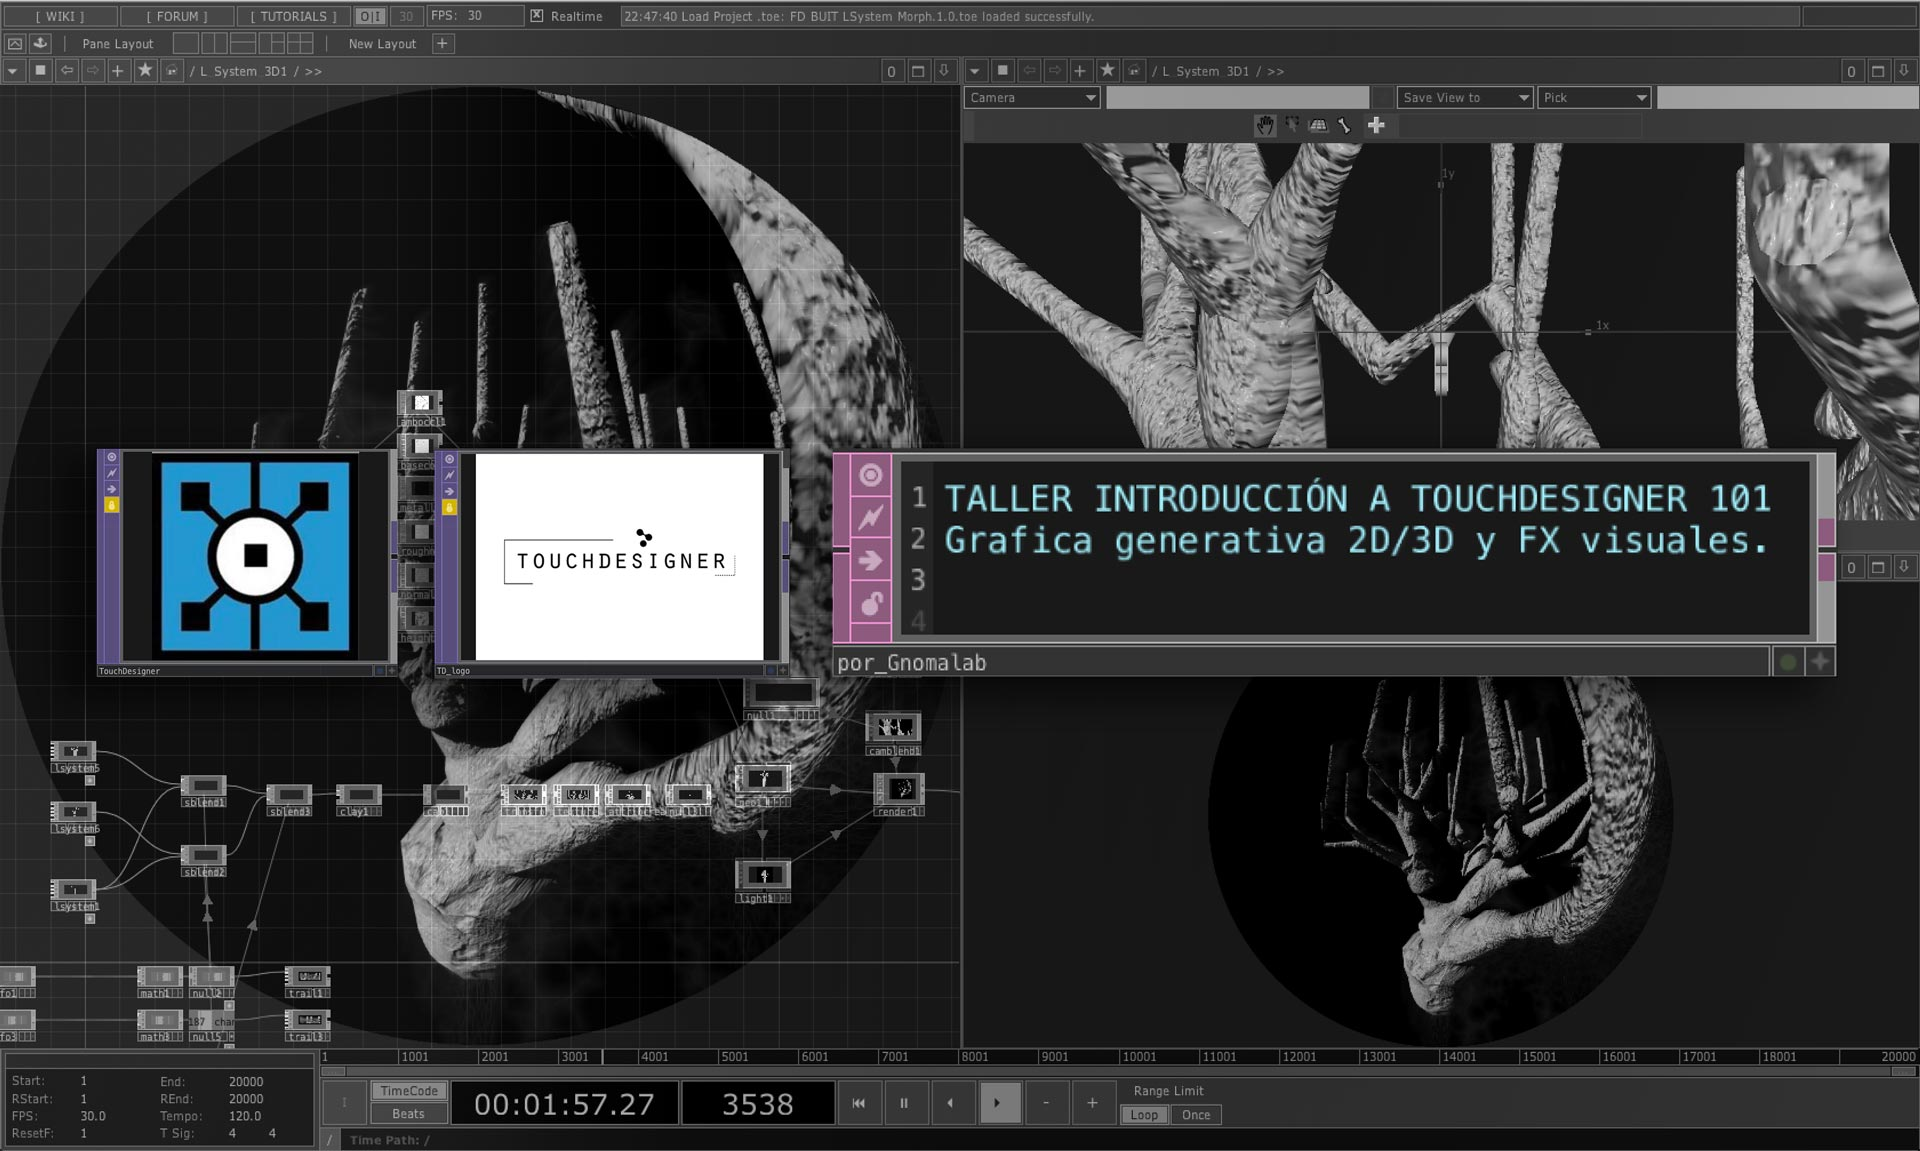 taller-touchdesigner-demo.jpg